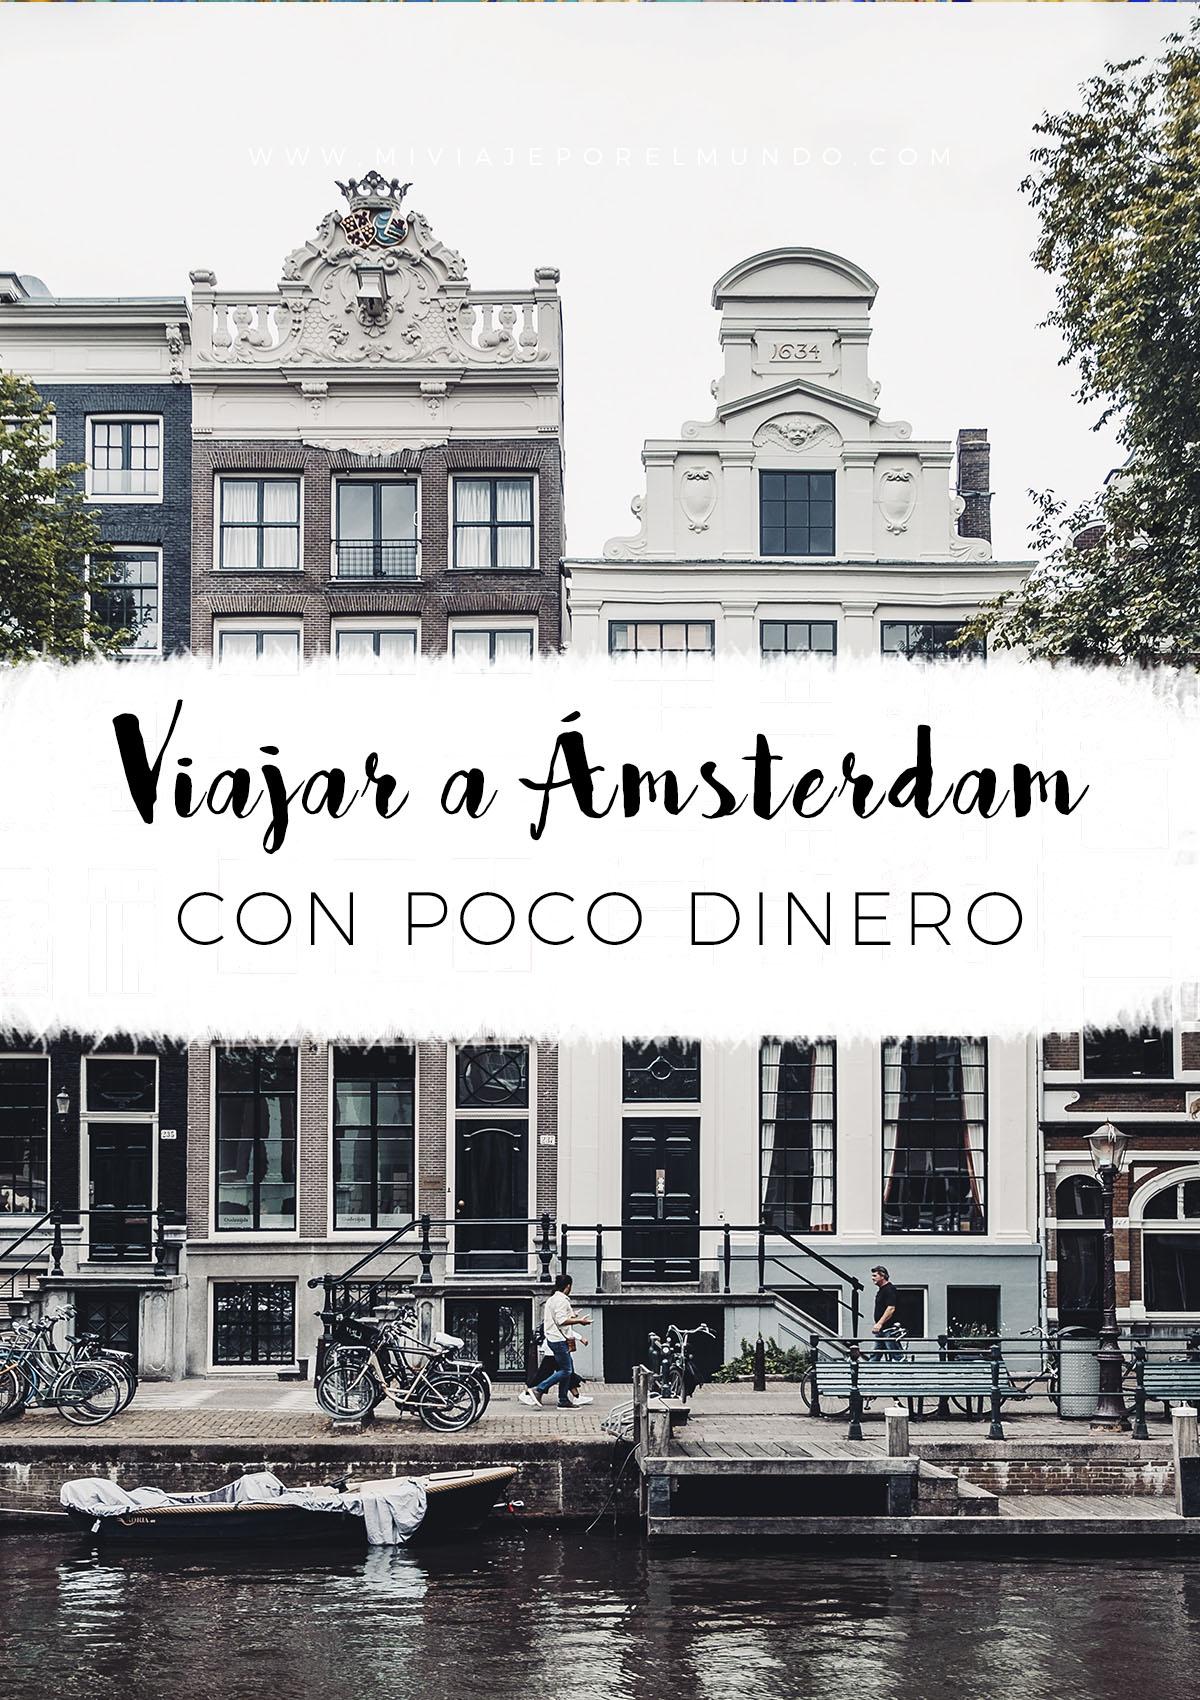 como viajar barato a amsterdam